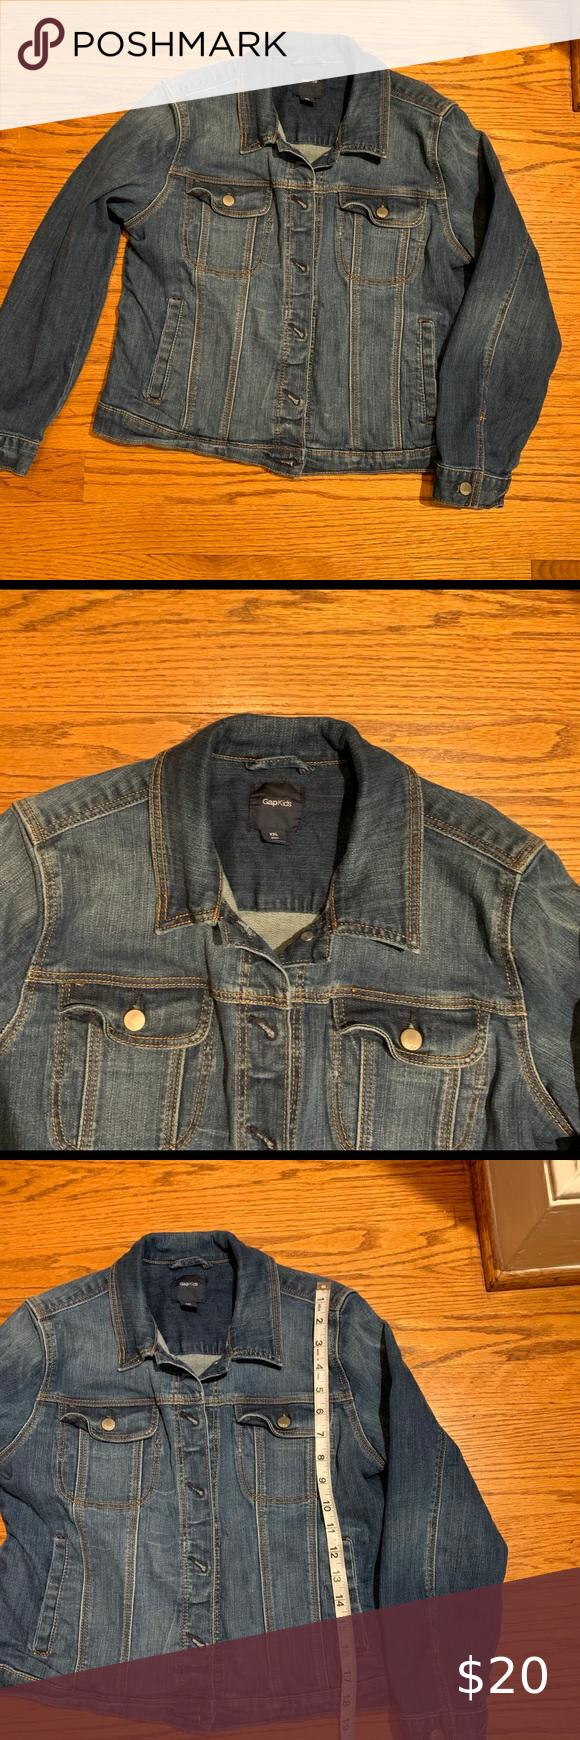 Gap Kids Jean Jacket Size Xxl Plus Jeans Kids Kids Jeans Jacket Baby Denim Jacket [ 1740 x 580 Pixel ]